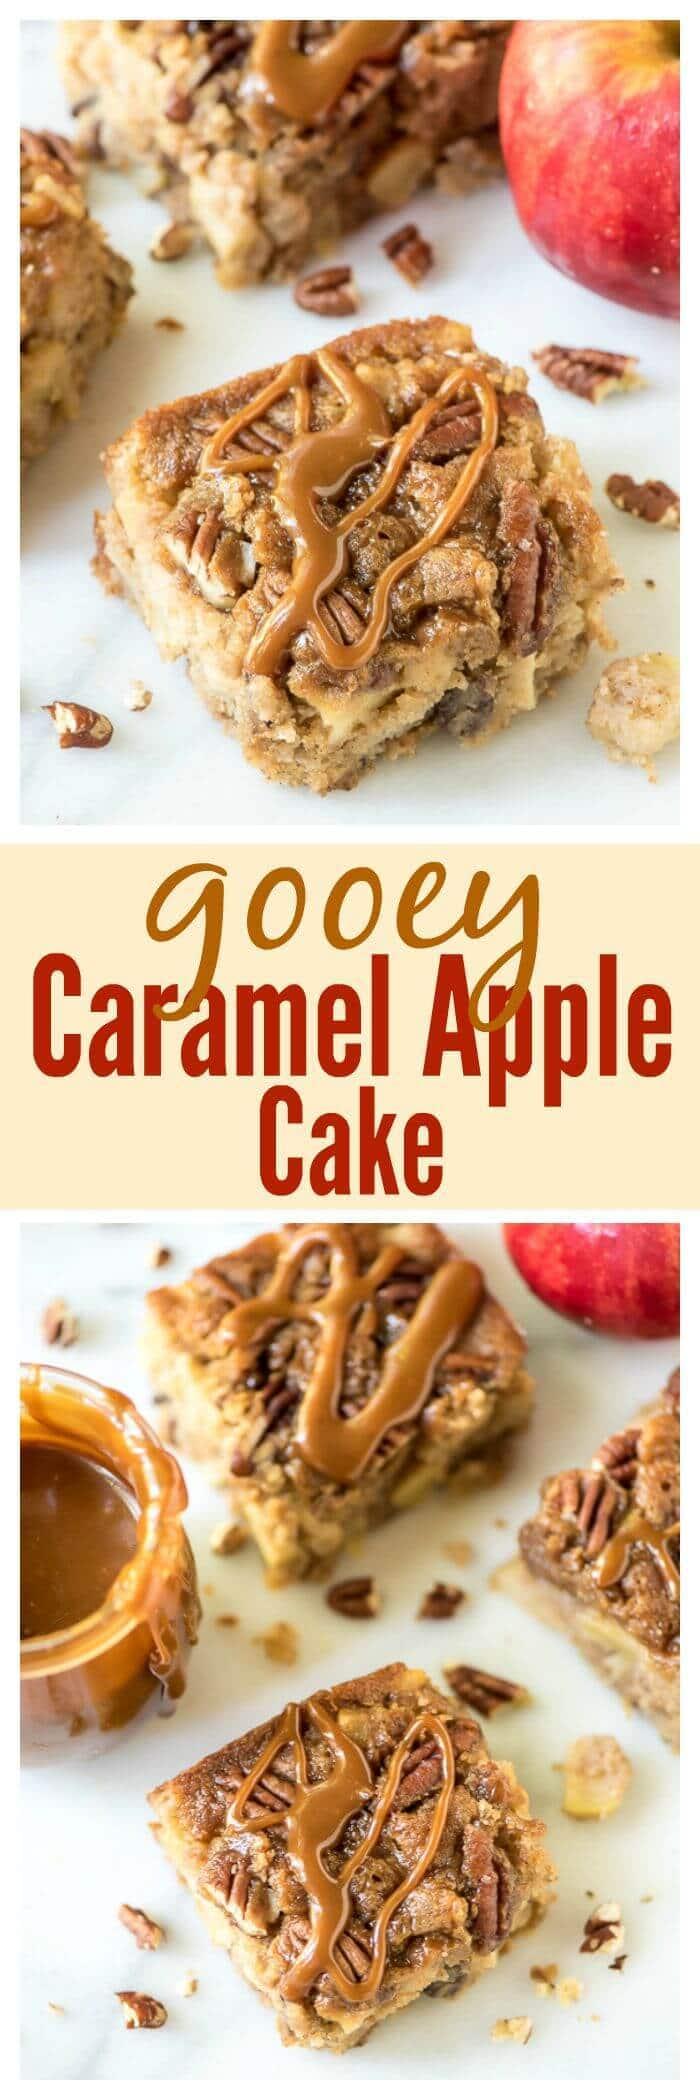 Gooey Caramel Apple Cake. Like a cross between gooey butter cake and a caramel apple!